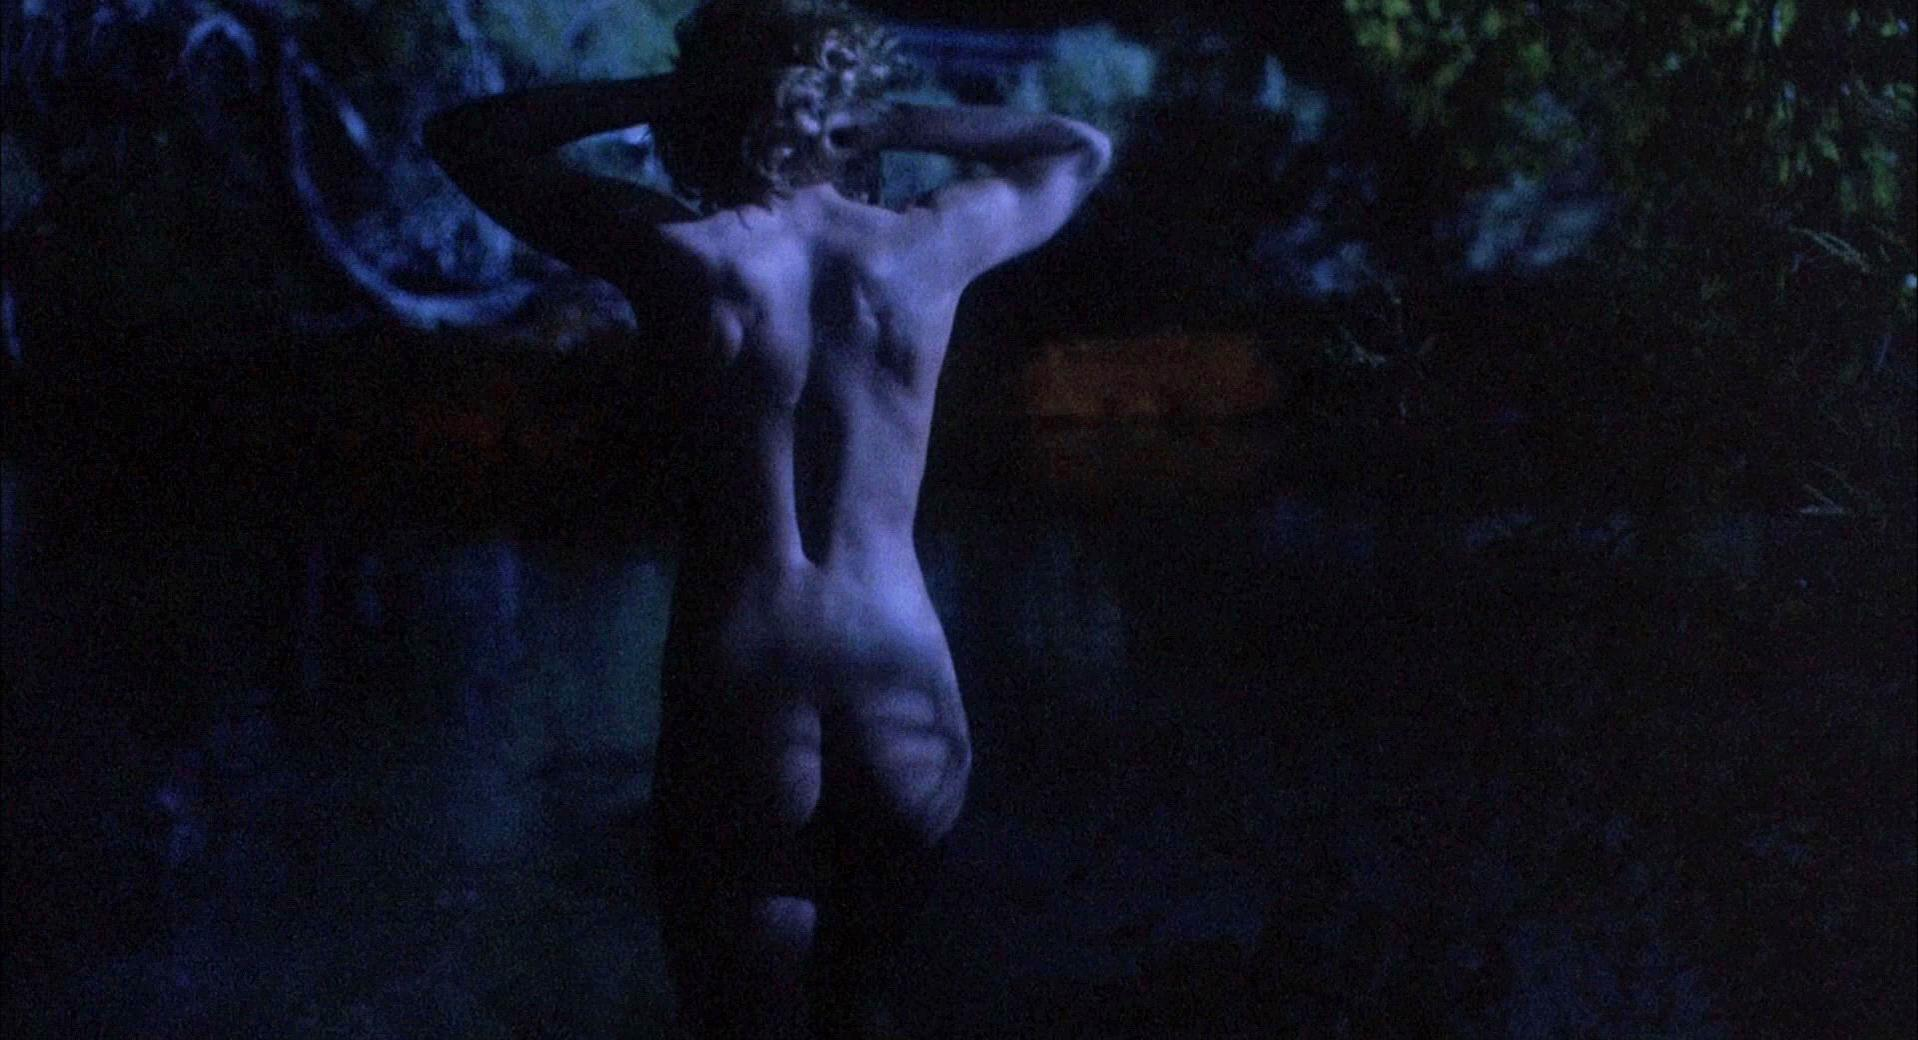 Virginia Madsen nude - The Hot Spot (1990)